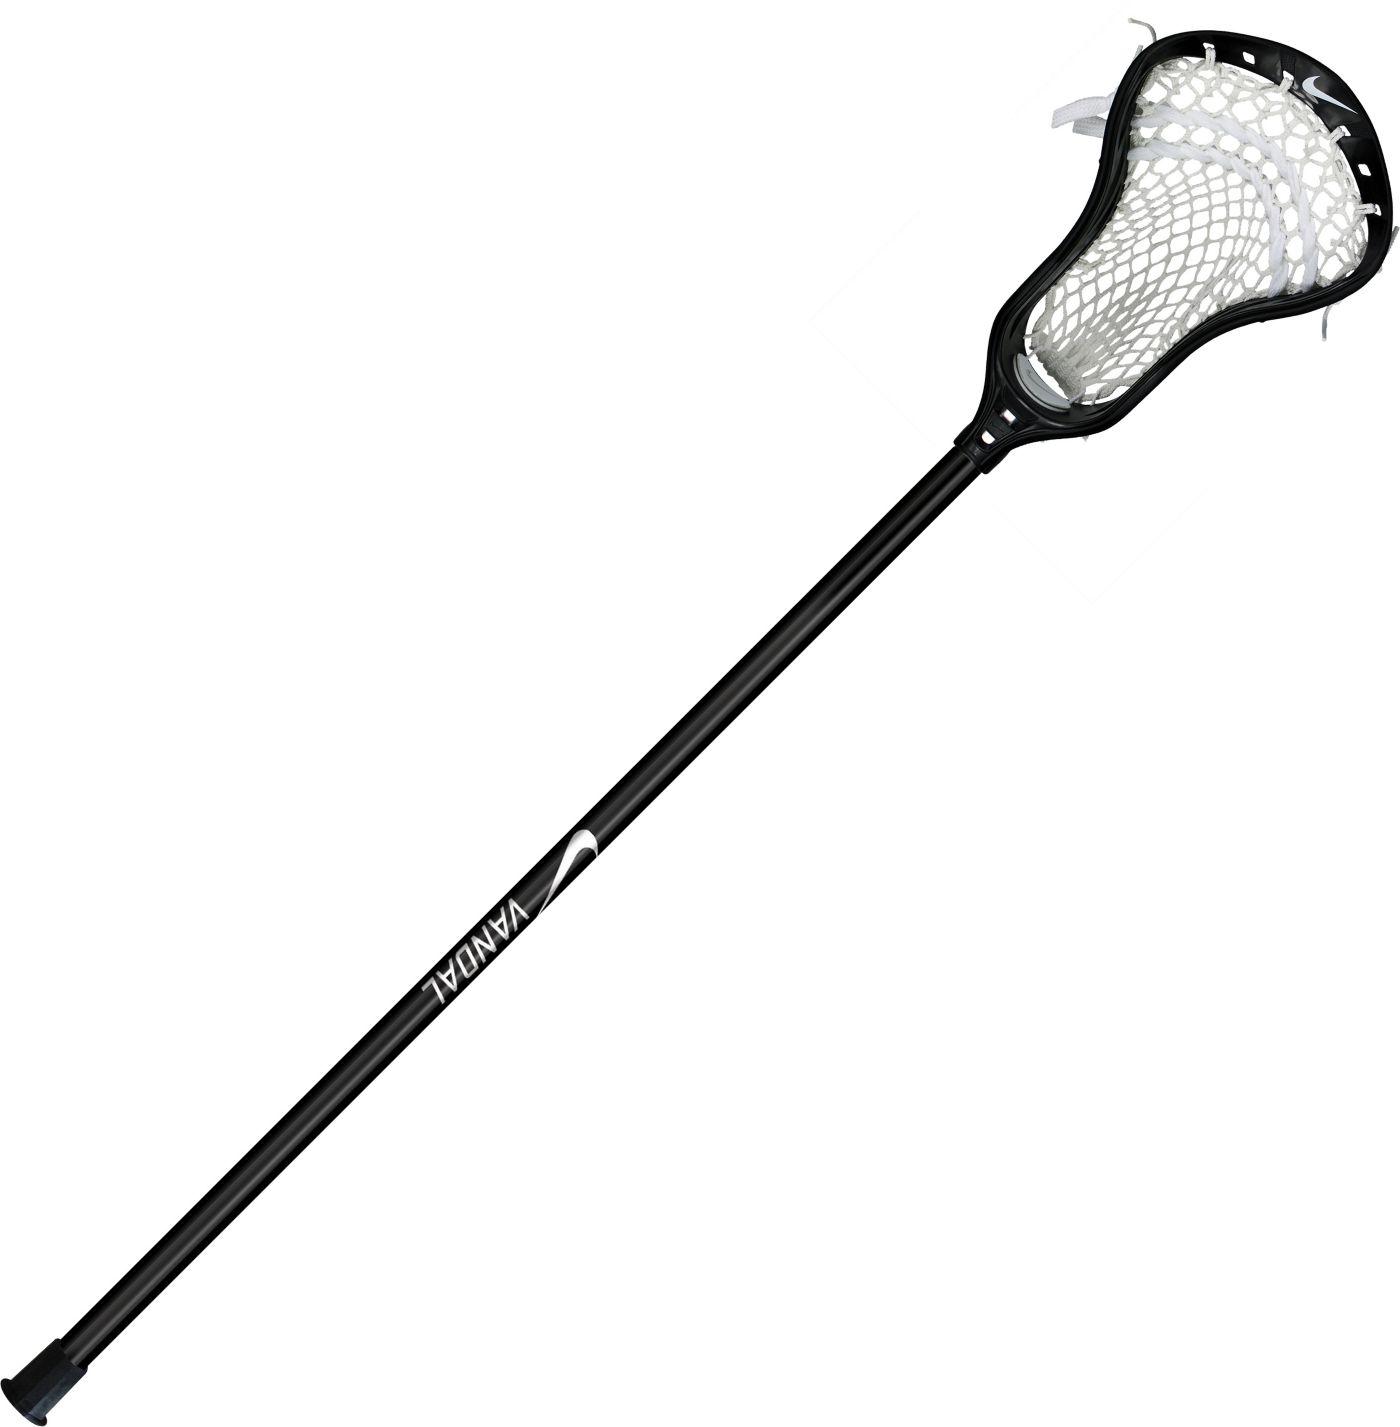 Nike Men's Vapor 2.0 on Vandal Complete Defense Lacrosse Stick